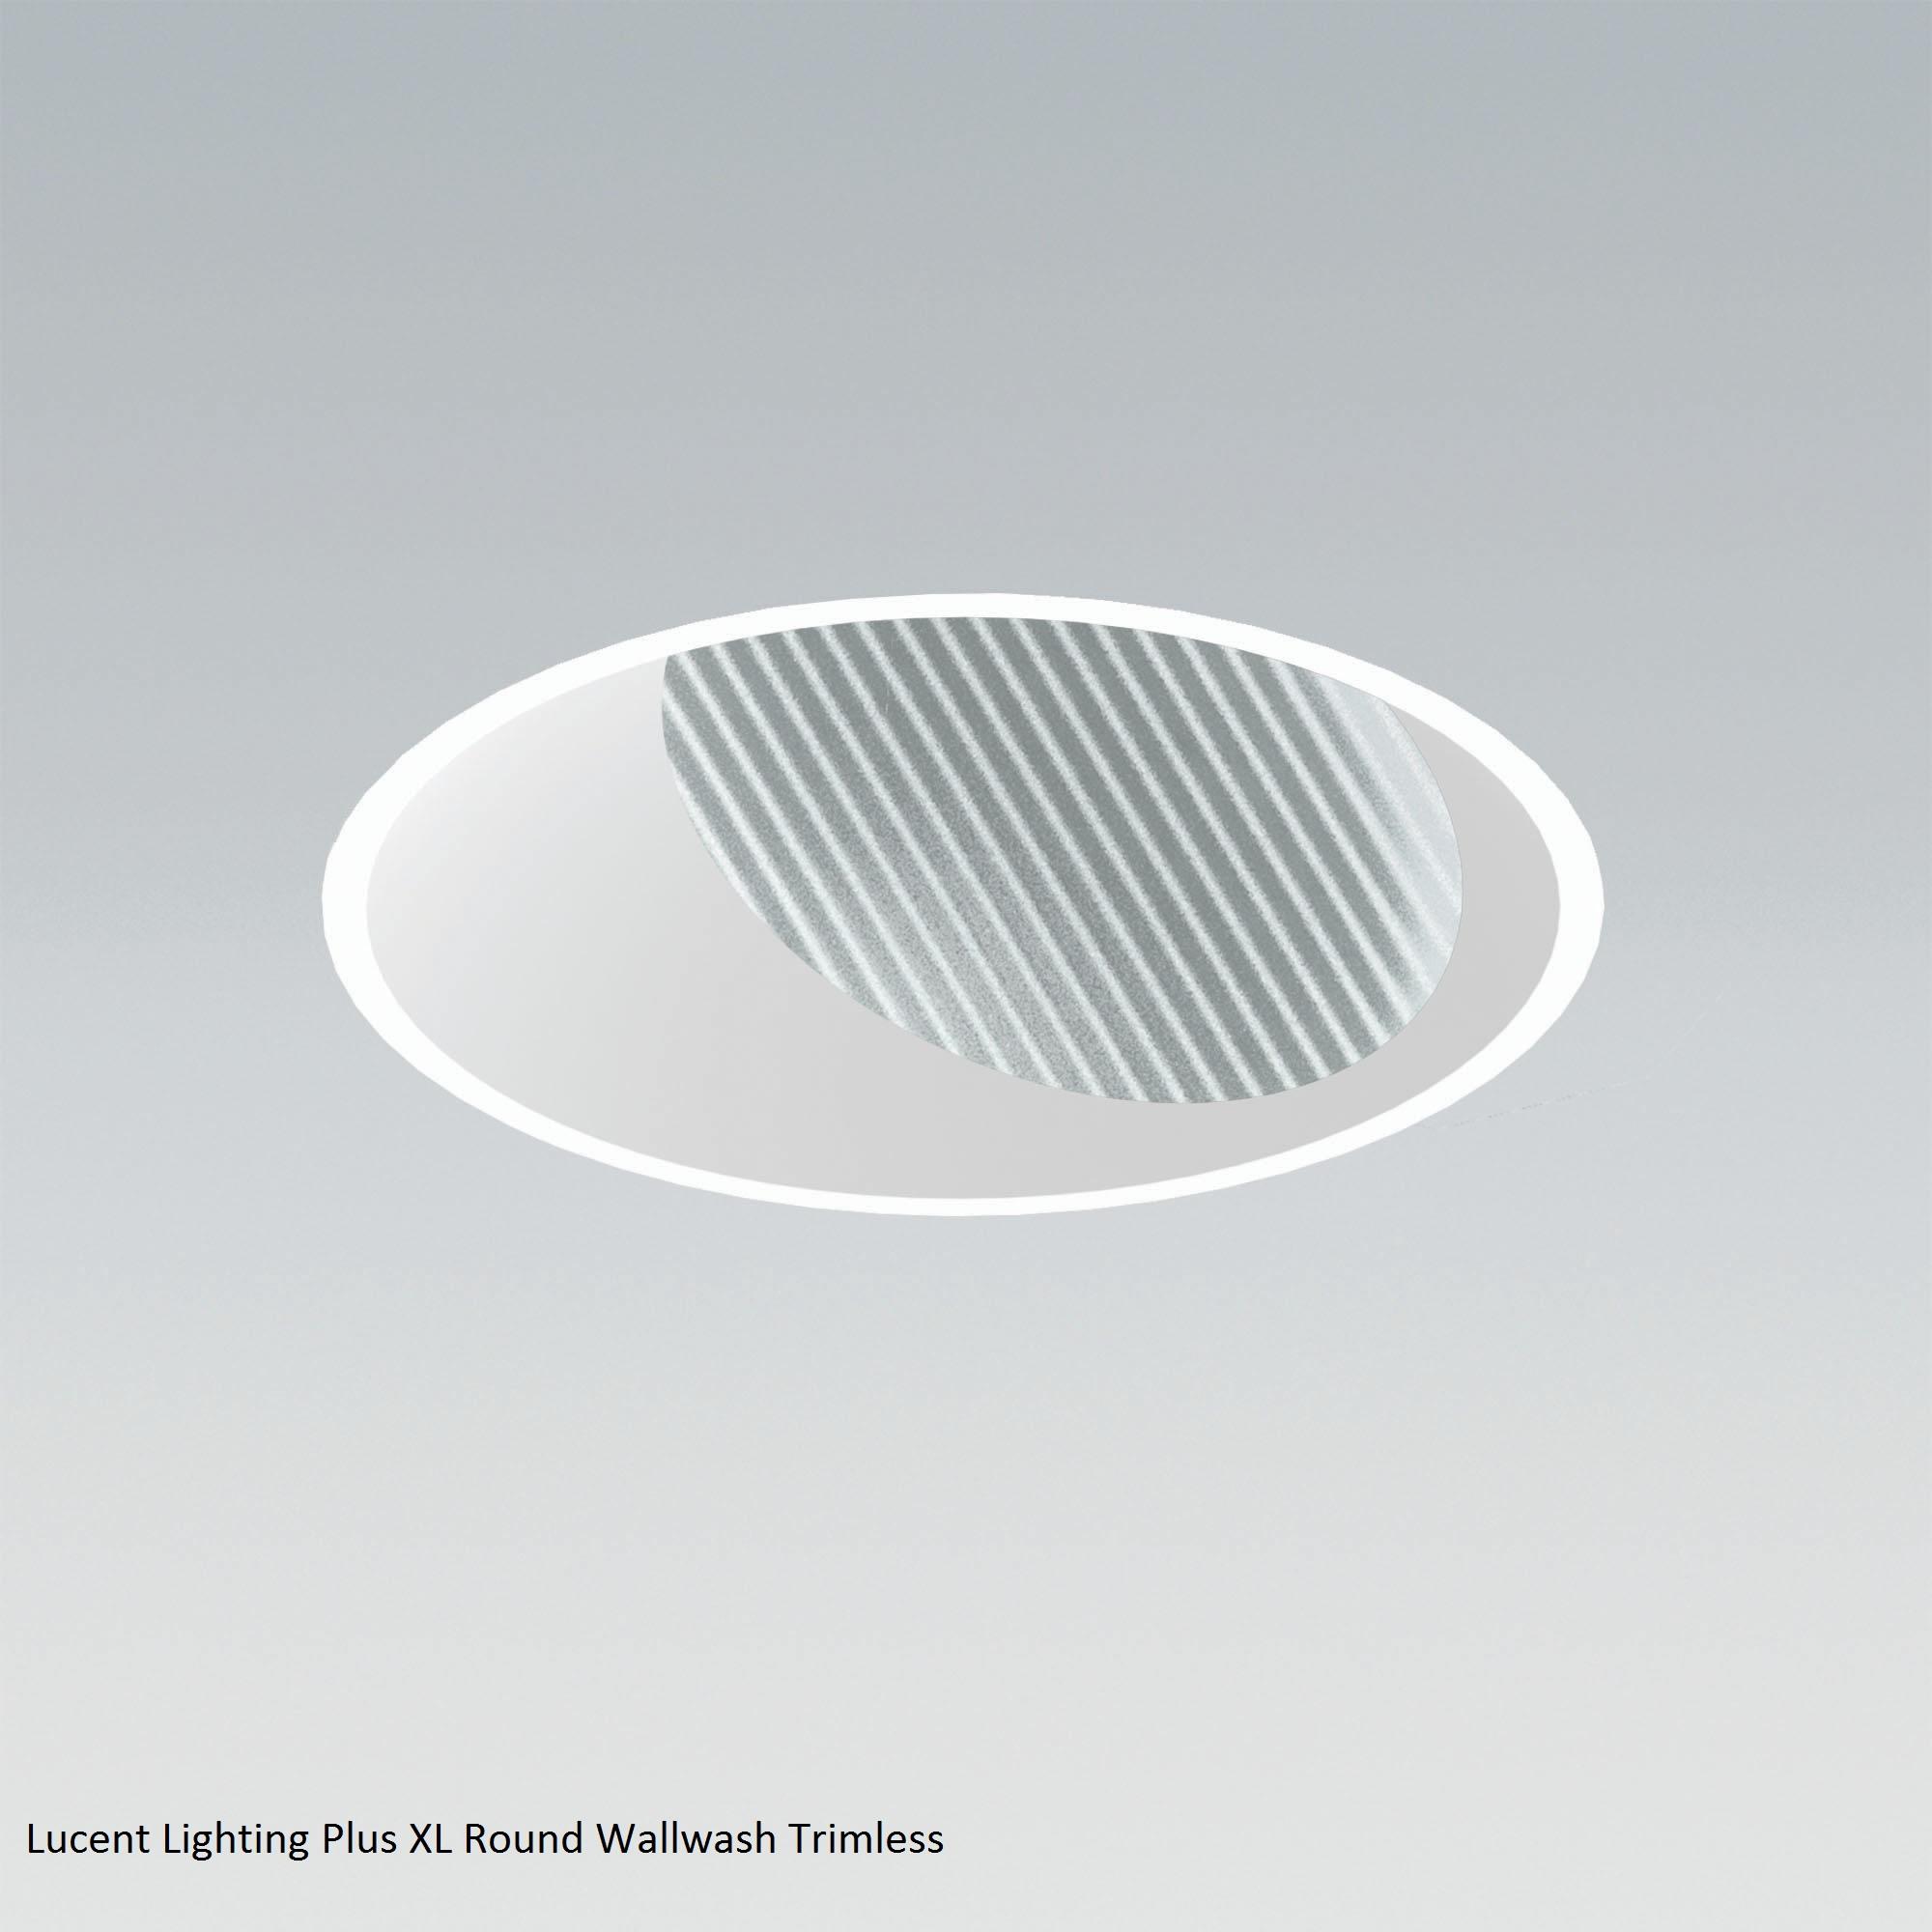 lucent-lighting-plus-xl-round-wallwash-trimless1519998435